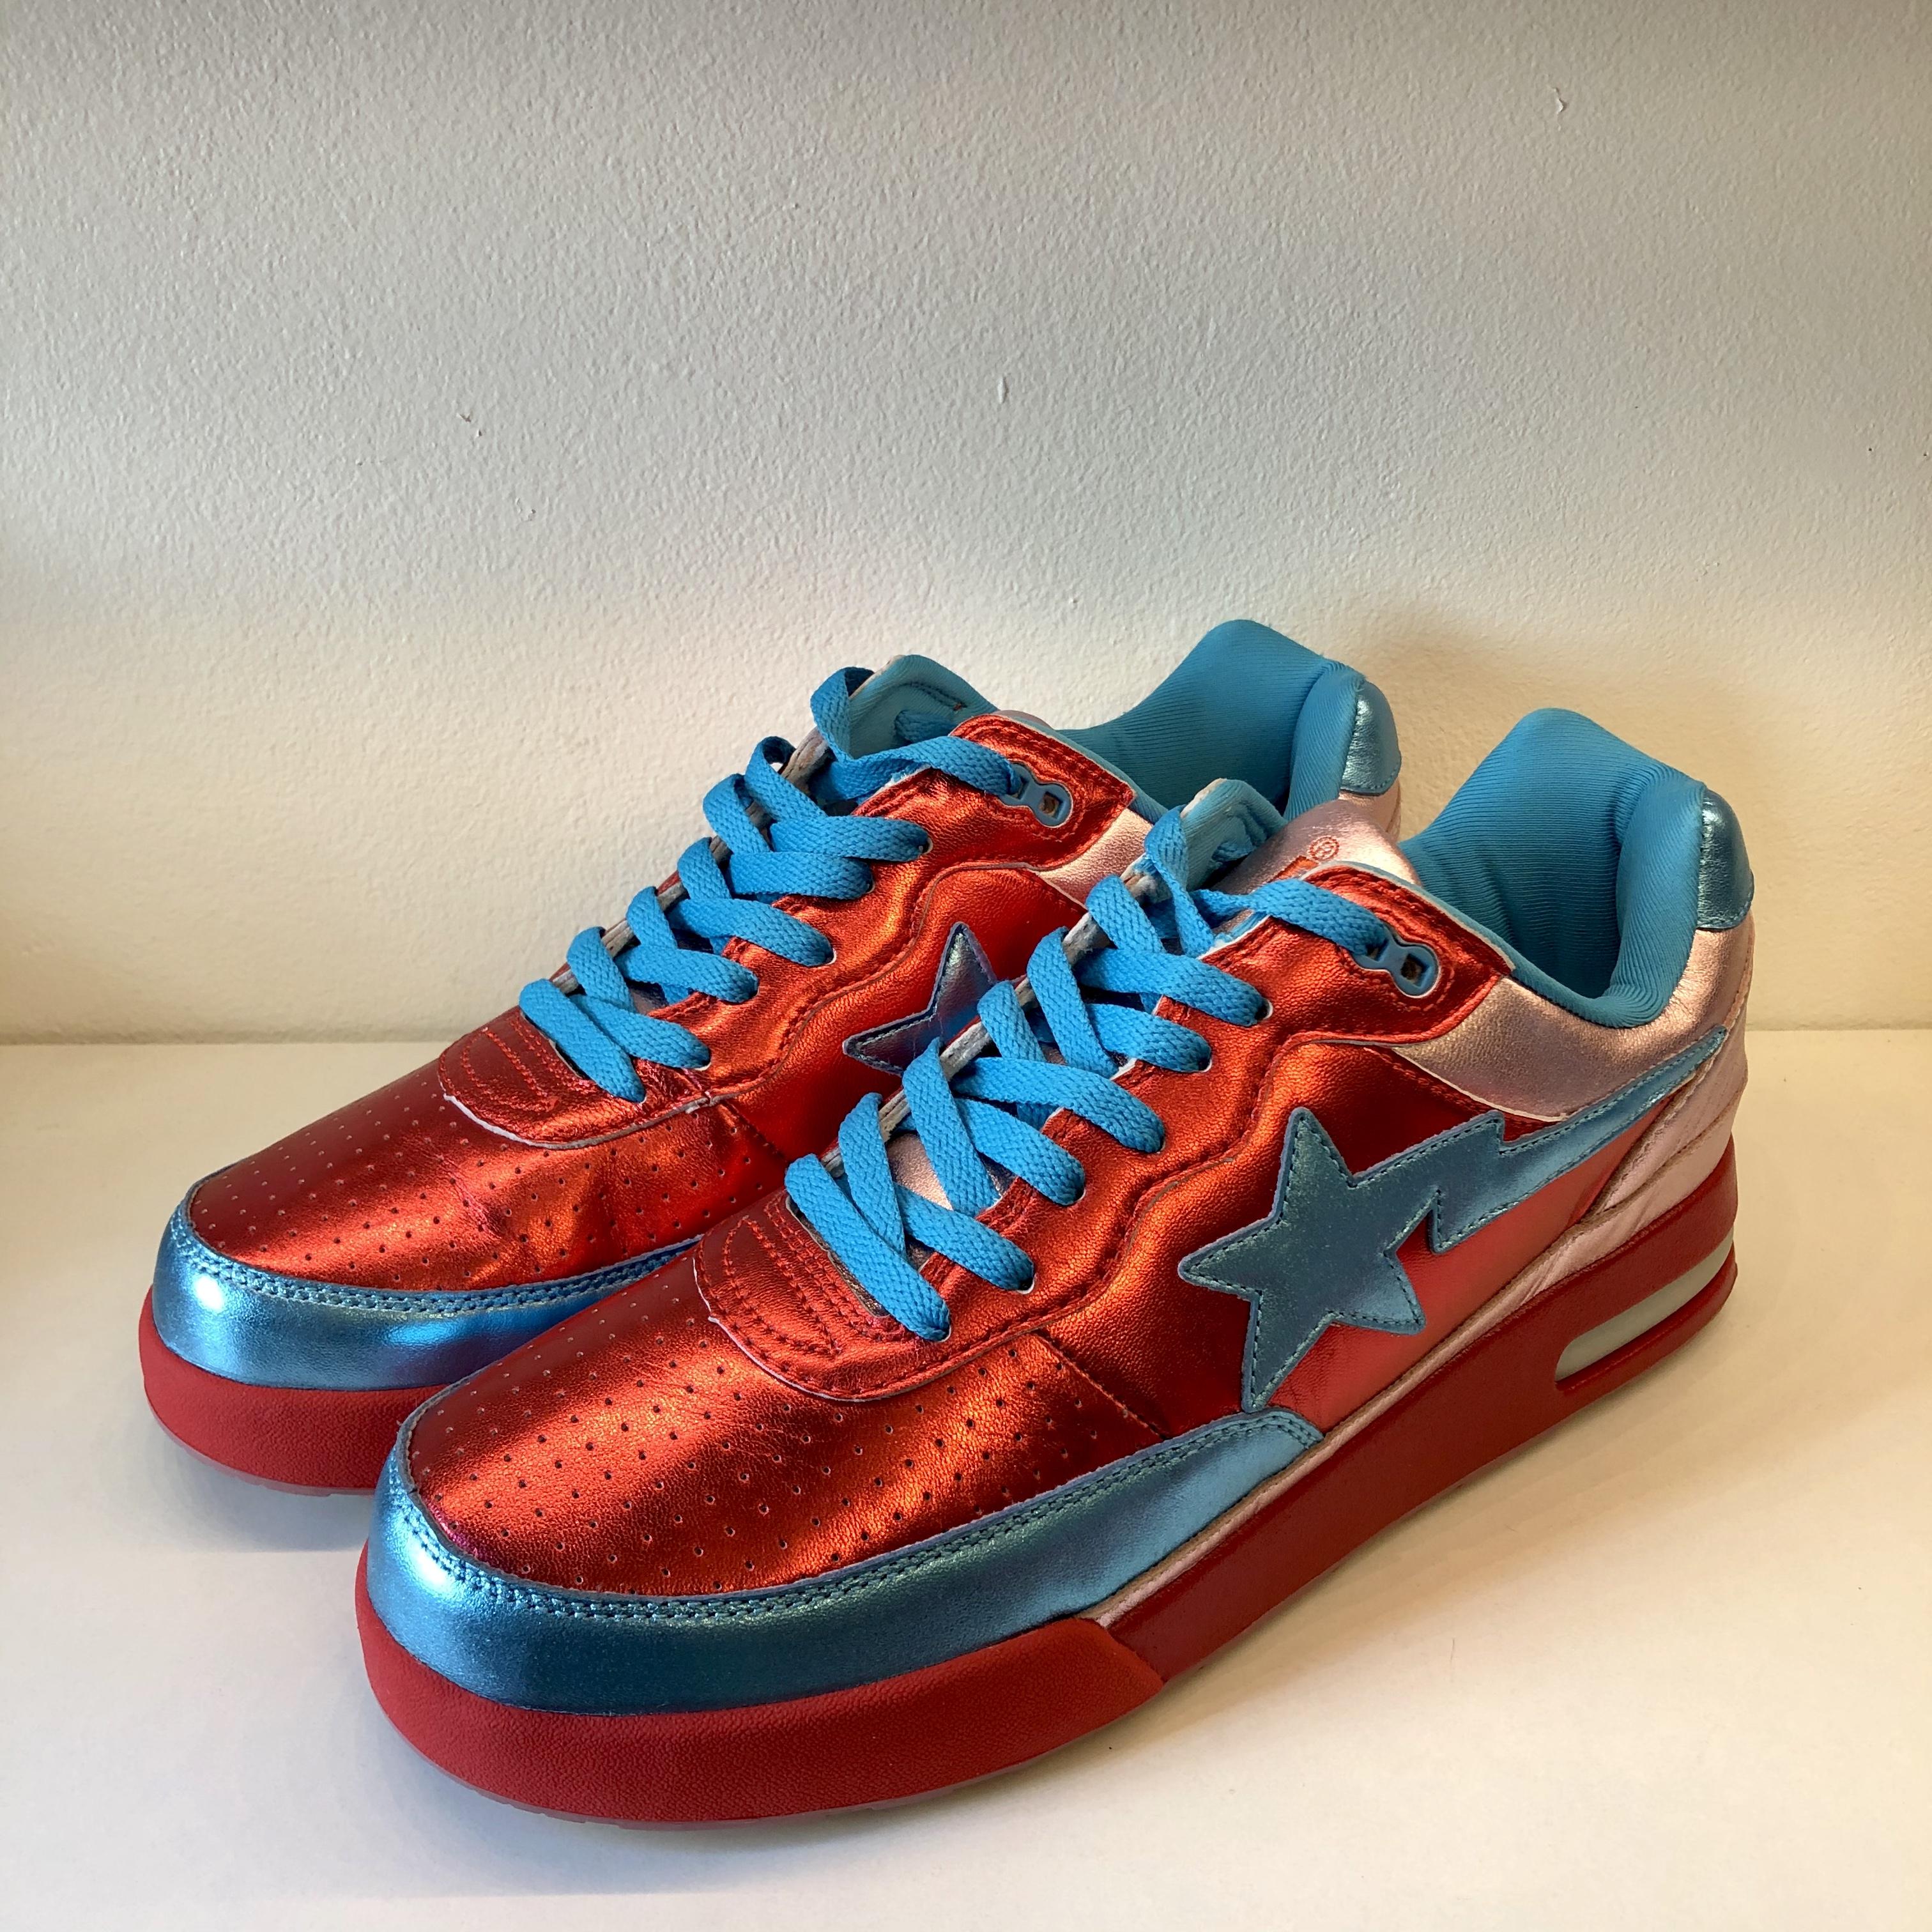 Bapesta Pharrell x Roadsta FS-034 Low Red Blue